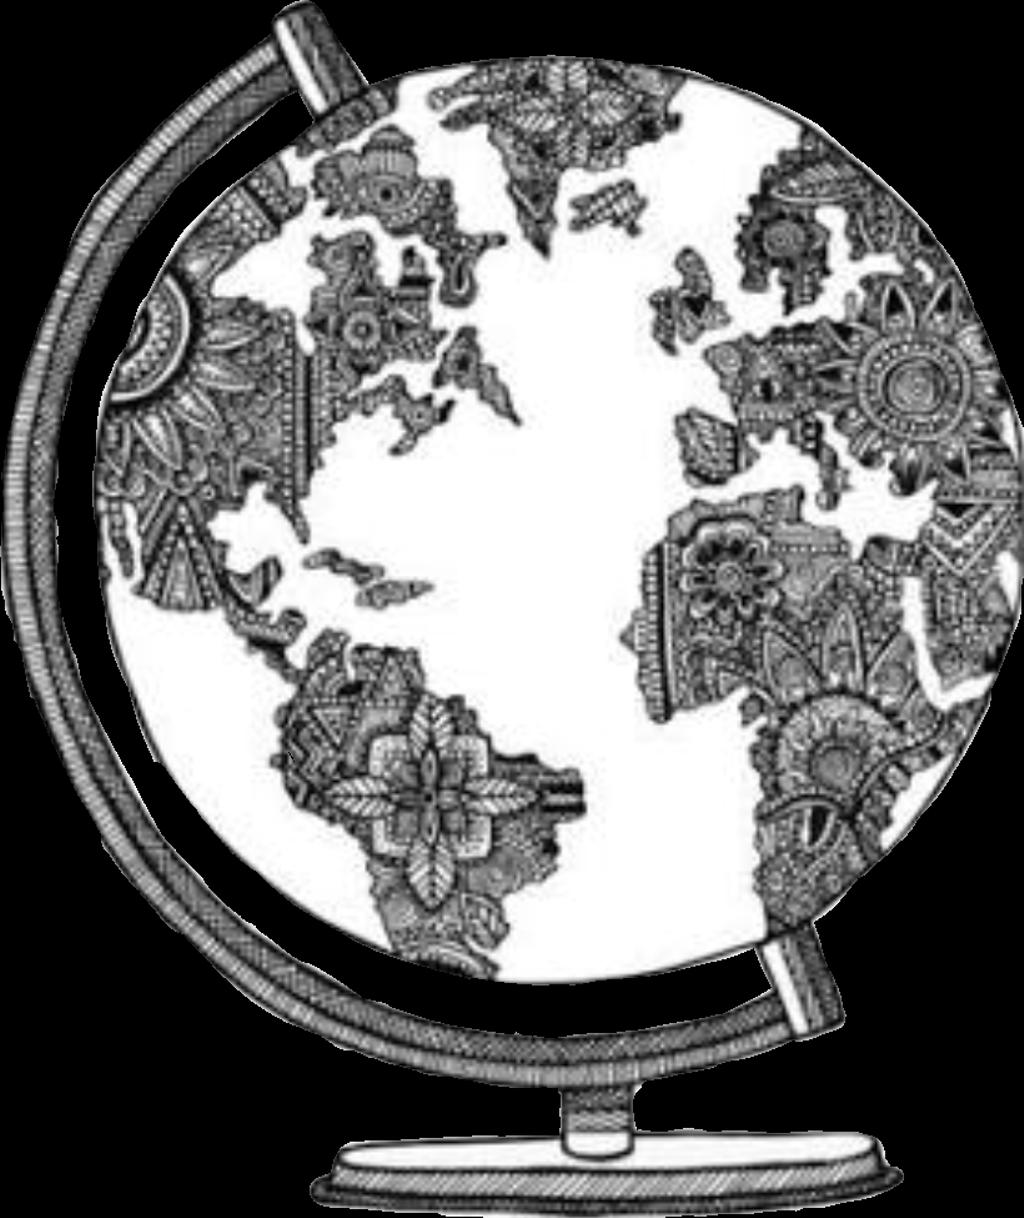 Download Mundo Sticker World Sketch Png Full Size Png Image Pngkit